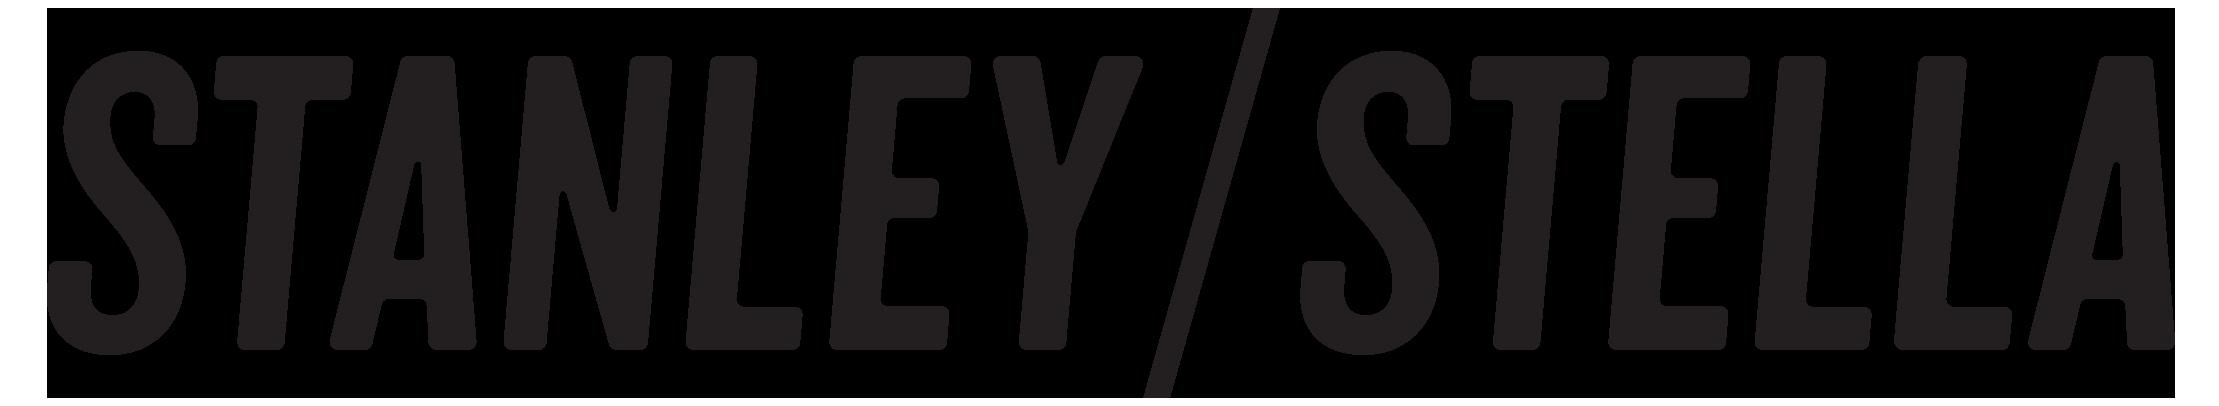 STANLEY/STELLA Logo